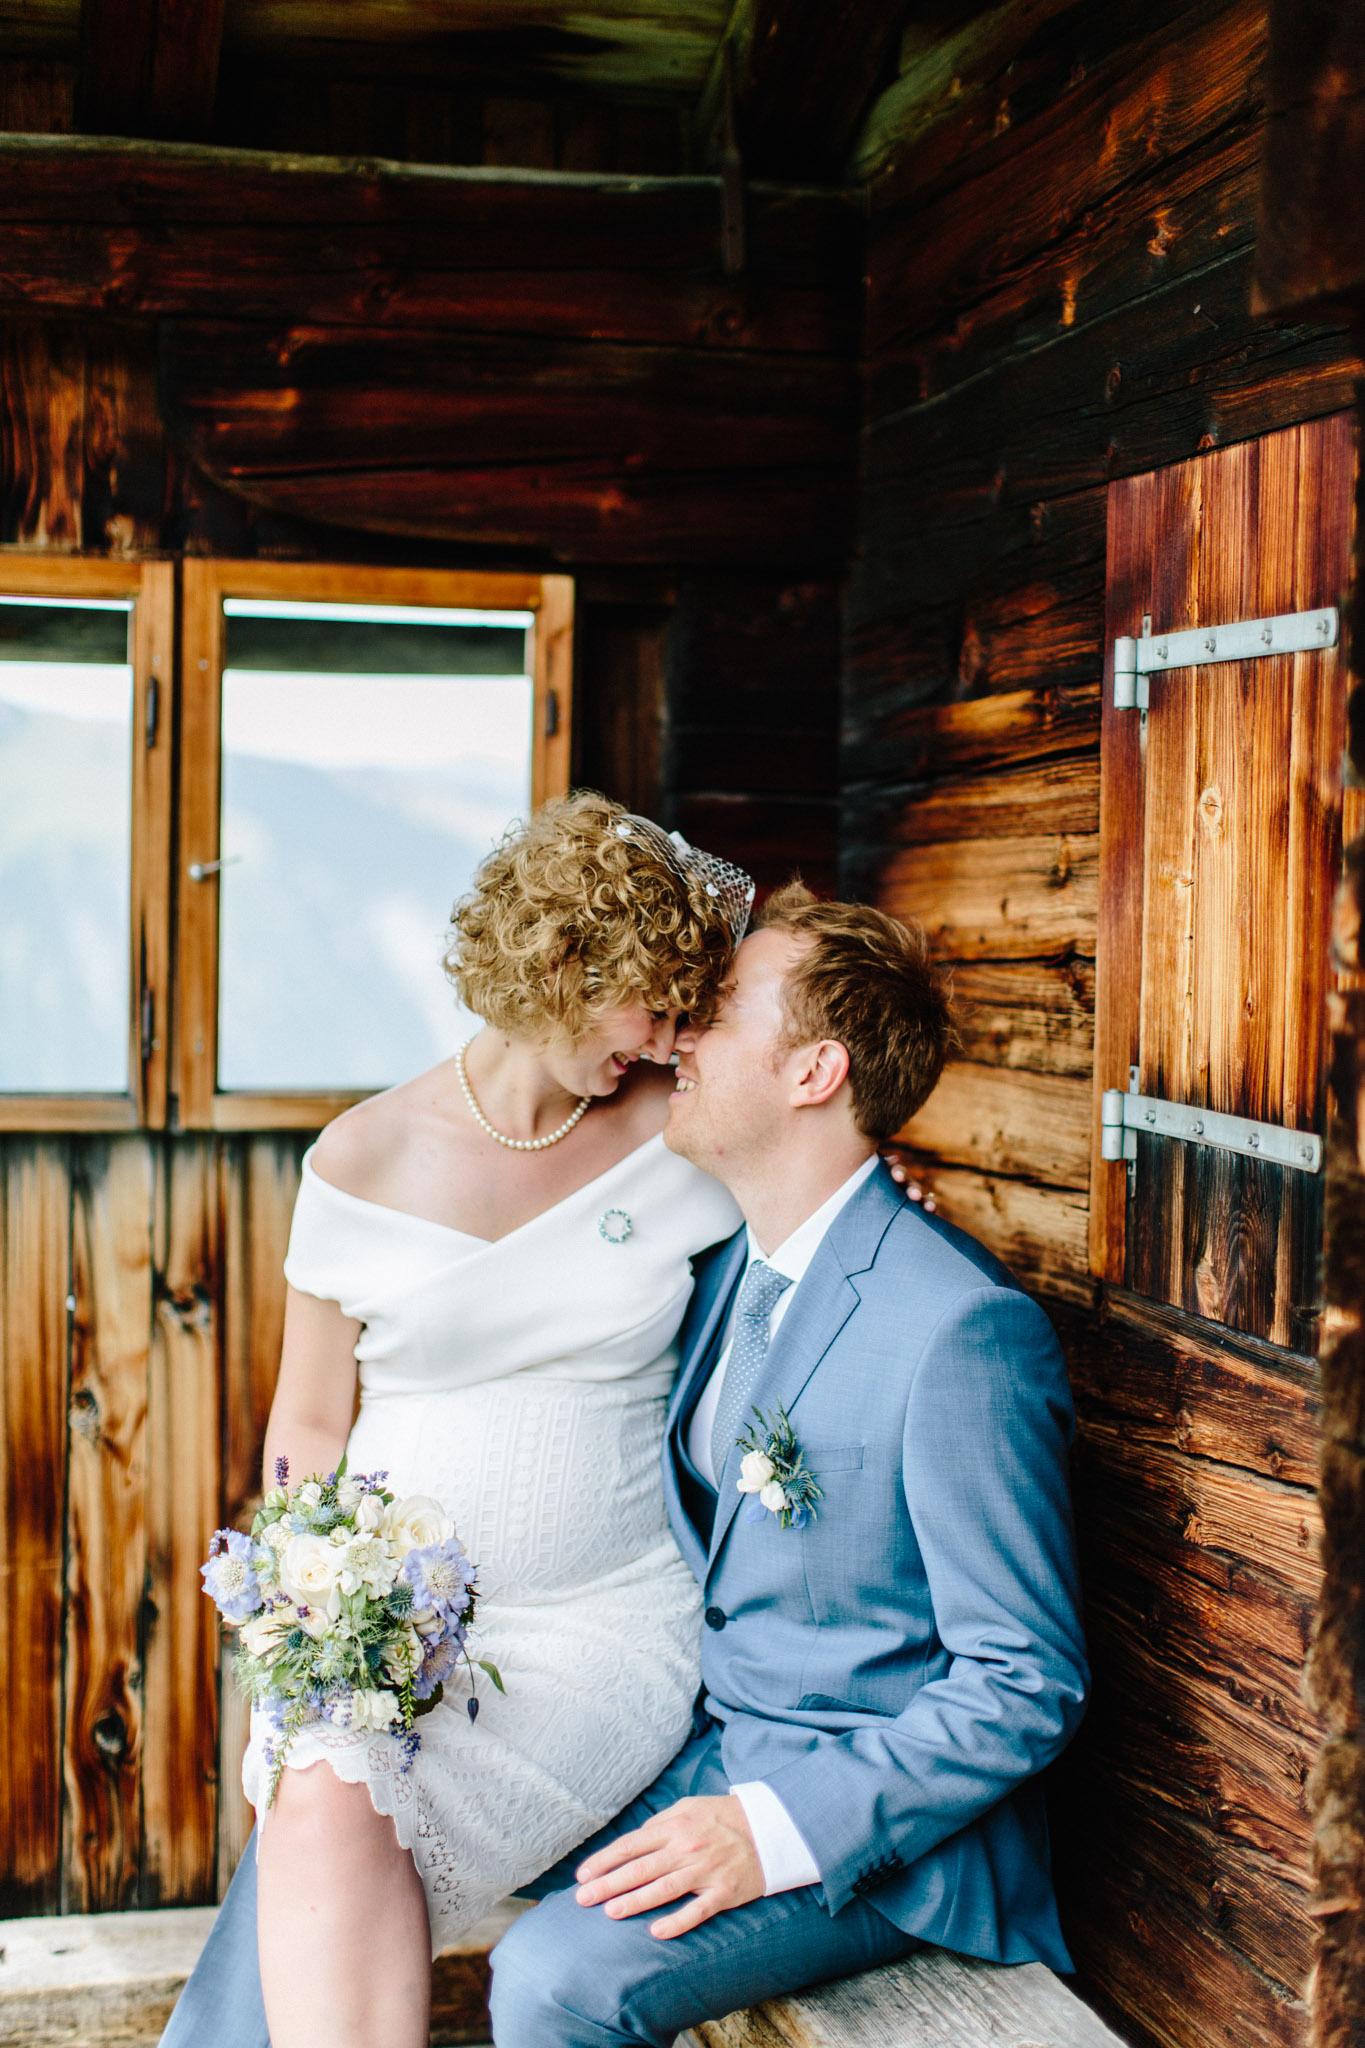 Lenl-Simmental-Buehlerhof-Pia-Anna-Christian-Wedding-Photography-EK-47.jpg